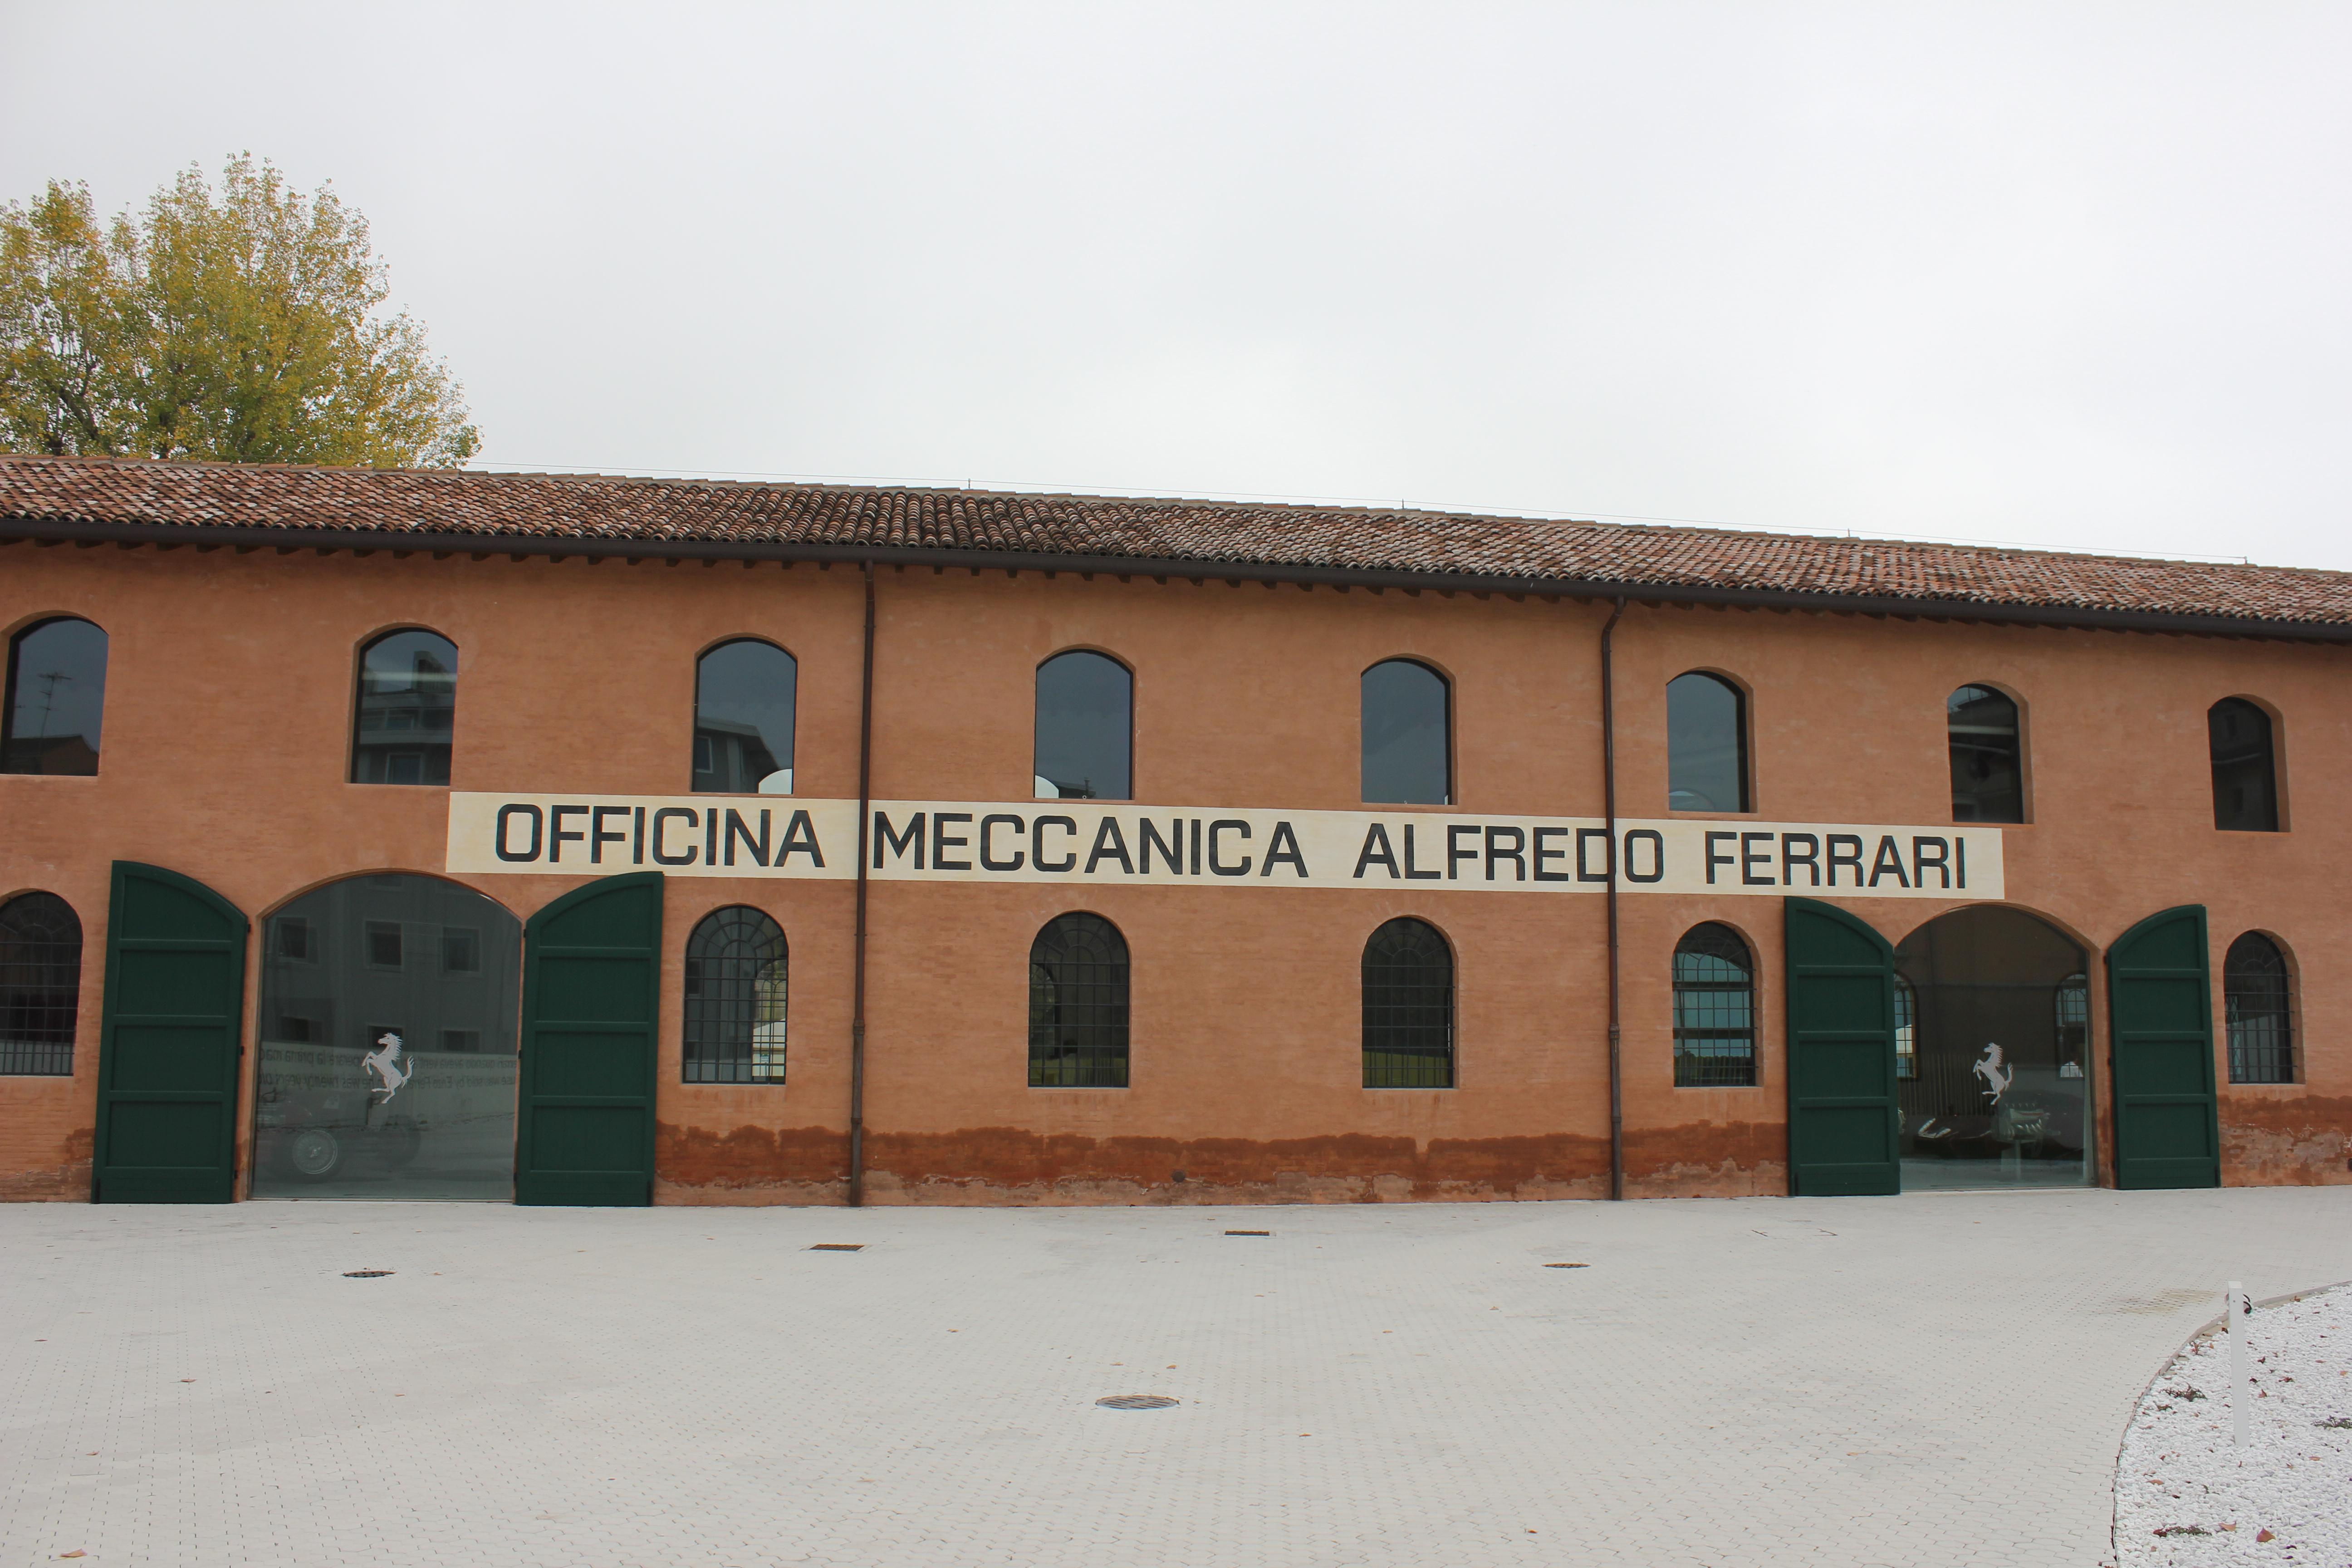 File Officina Meccanica Alfredo Ferrari 15589627240 Jpg Wikimedia Commons